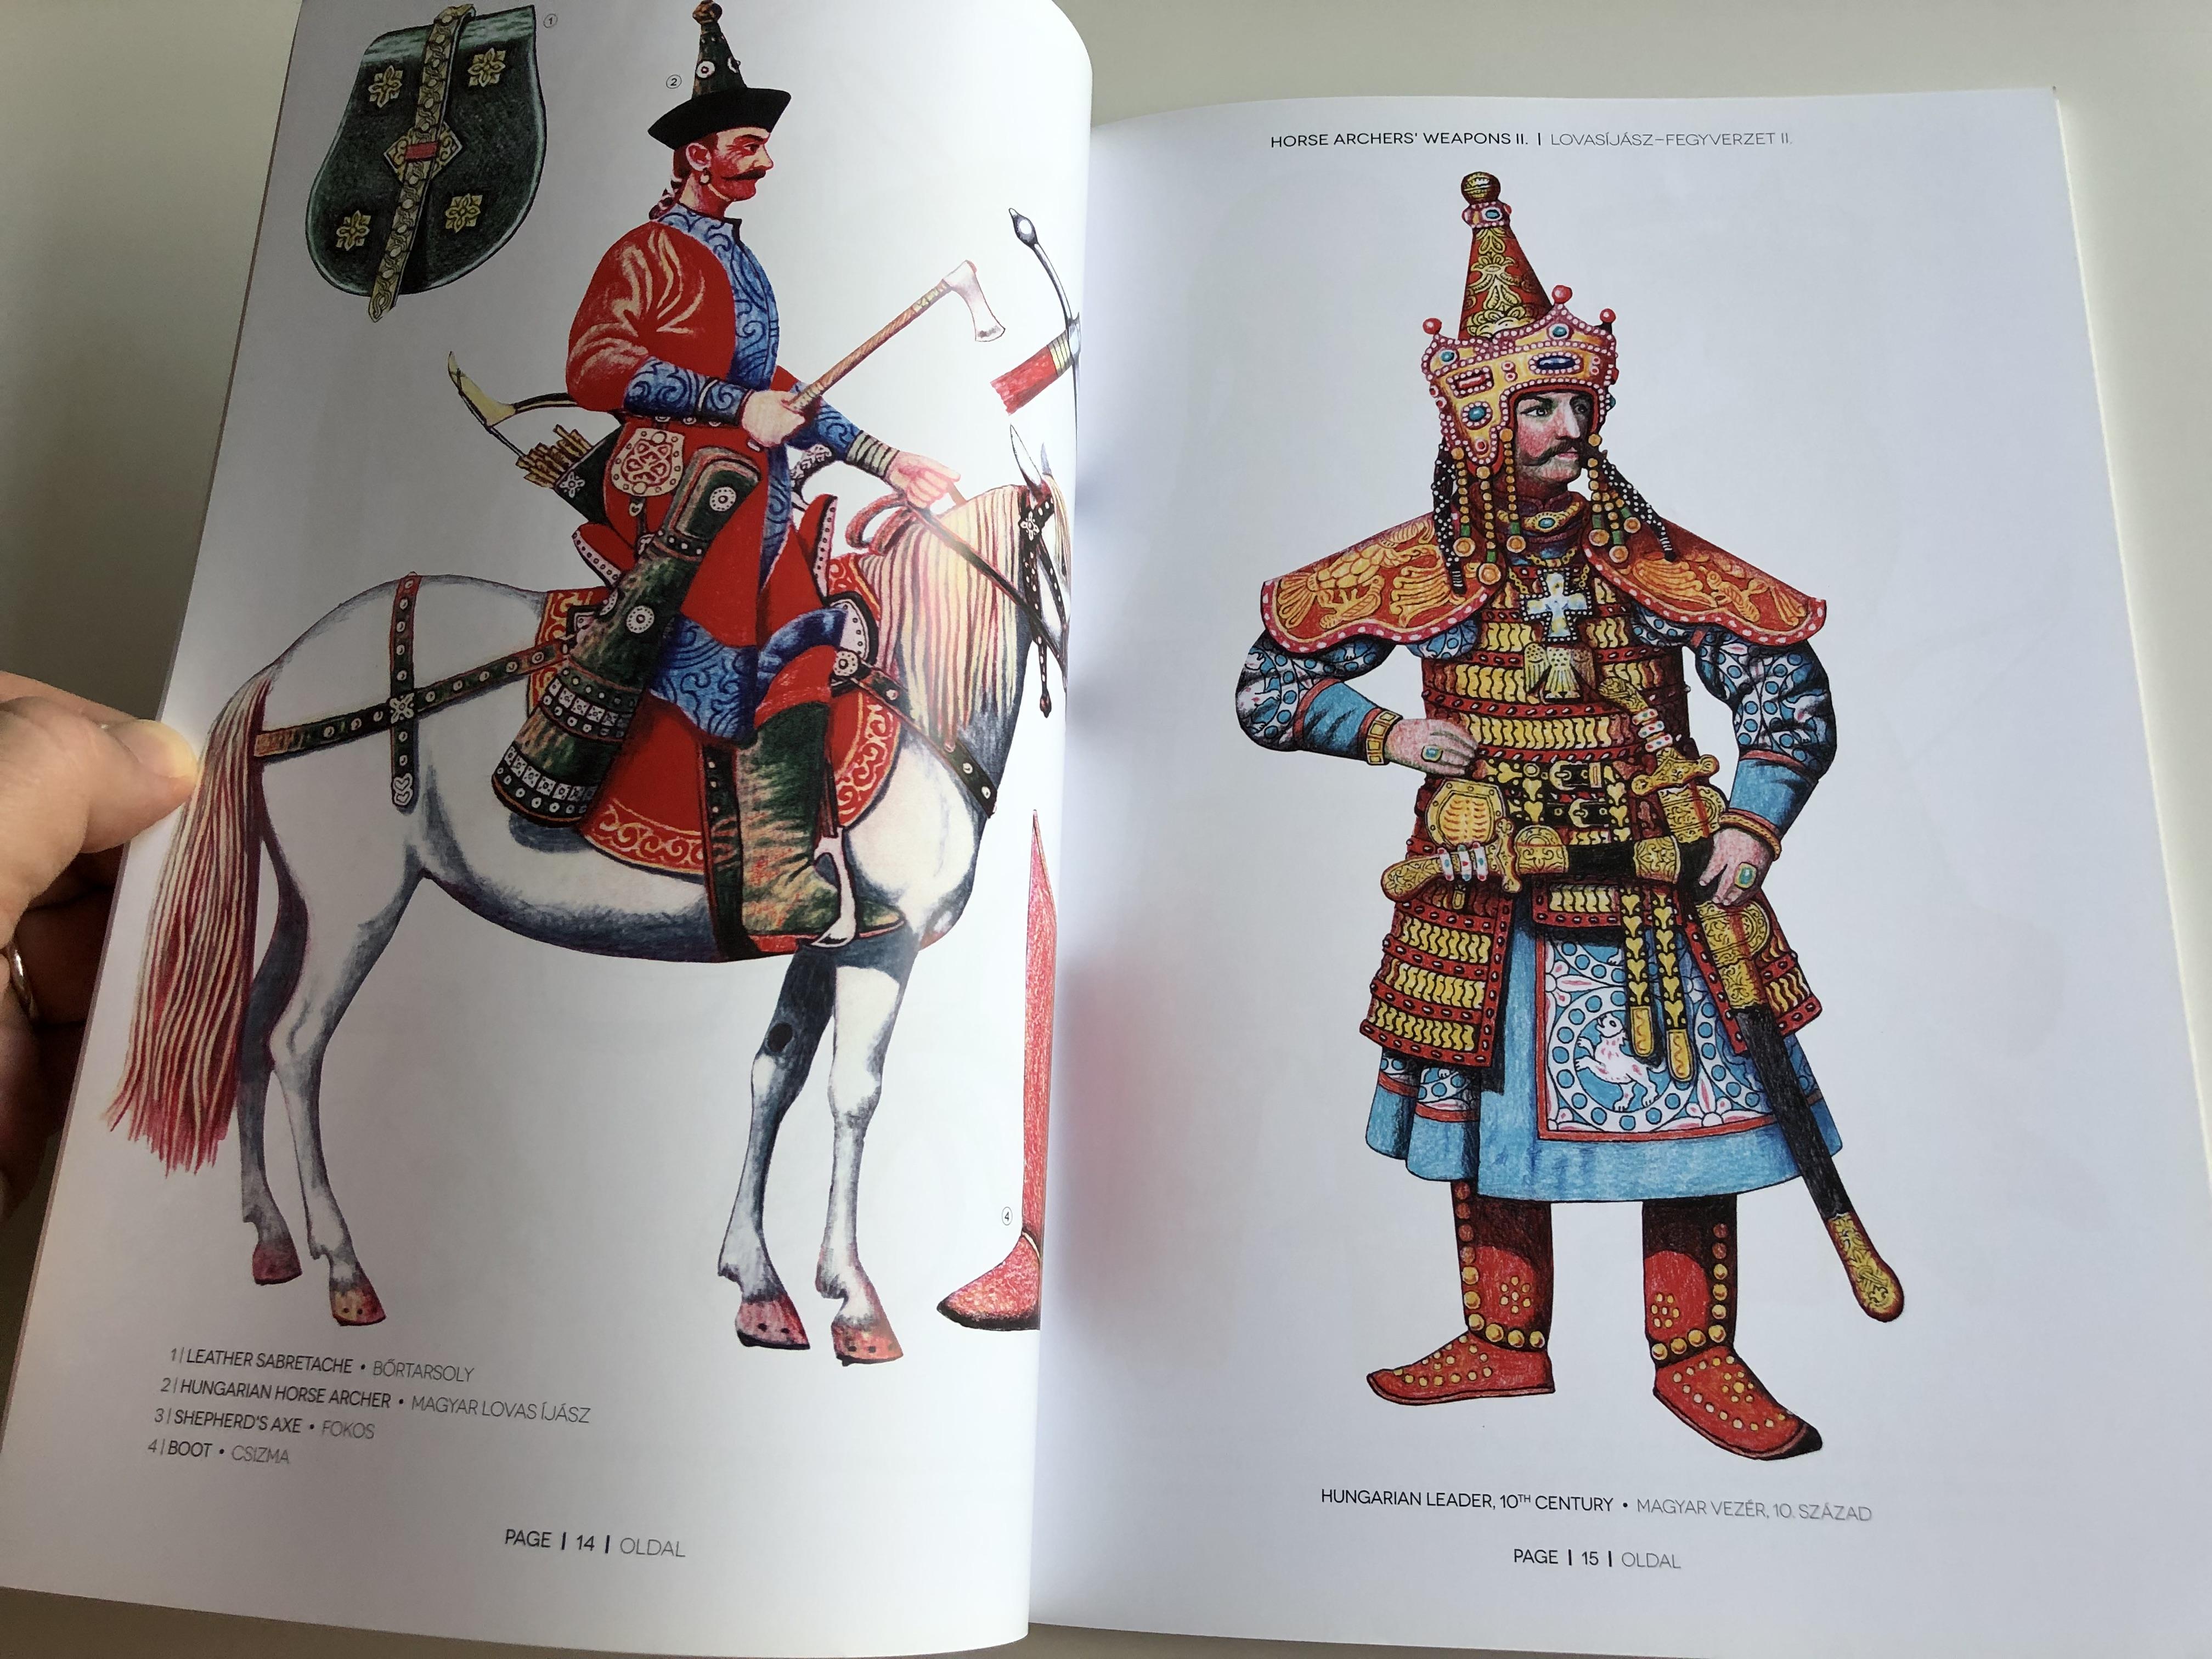 horse-archers-weapons-ii.-by-gy-z-somogyi-lovas-j-sz-fegyverzet-ii.-a-millenium-in-the-military-egy-ezred-v-hadban-paperback-2016-hm-zr-nyi-4-.jpg